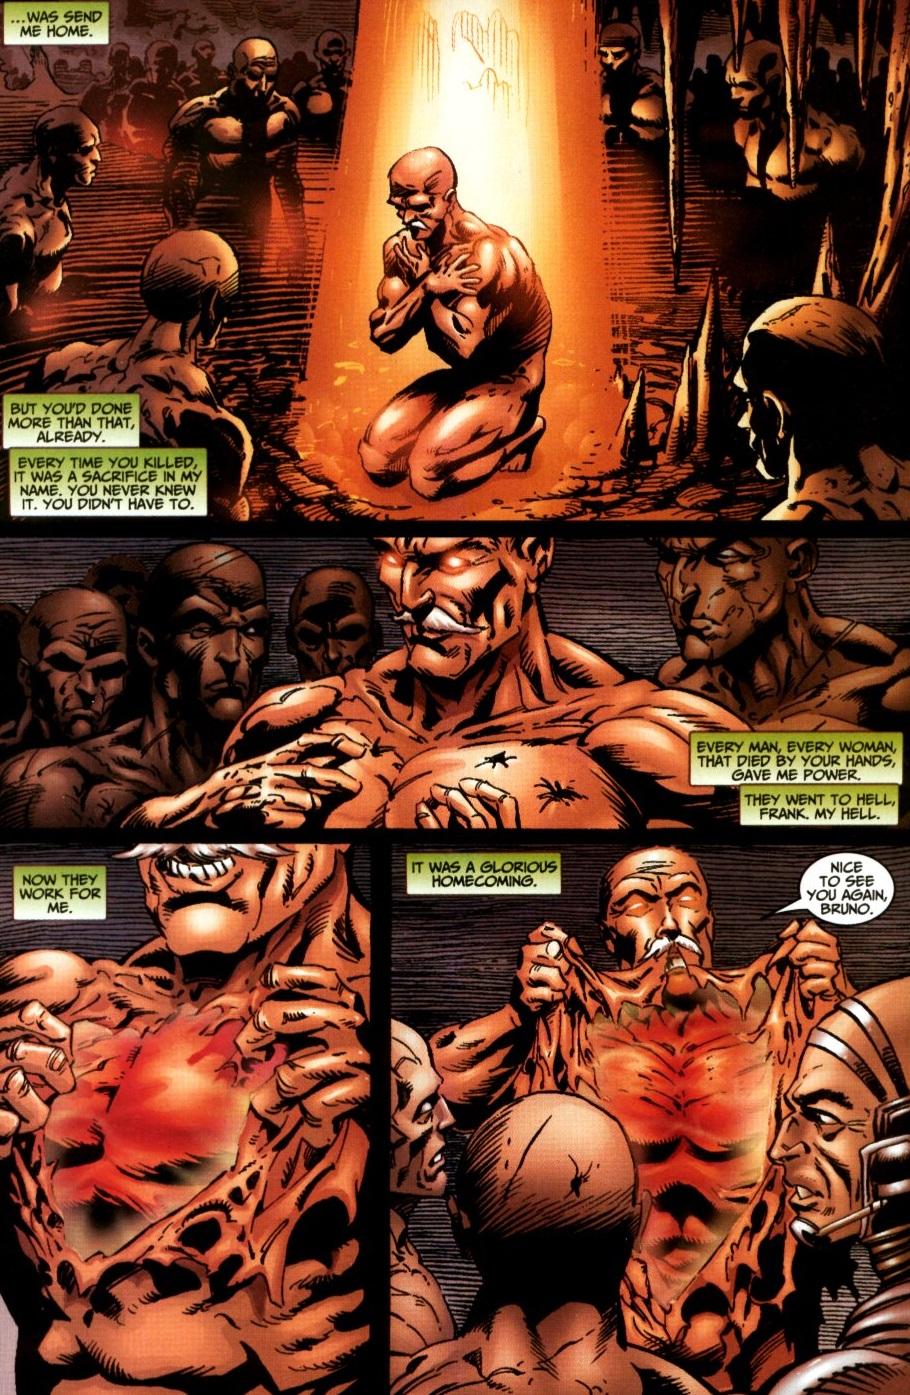 Frank Costa in Punisher Vol 4 4.jpg